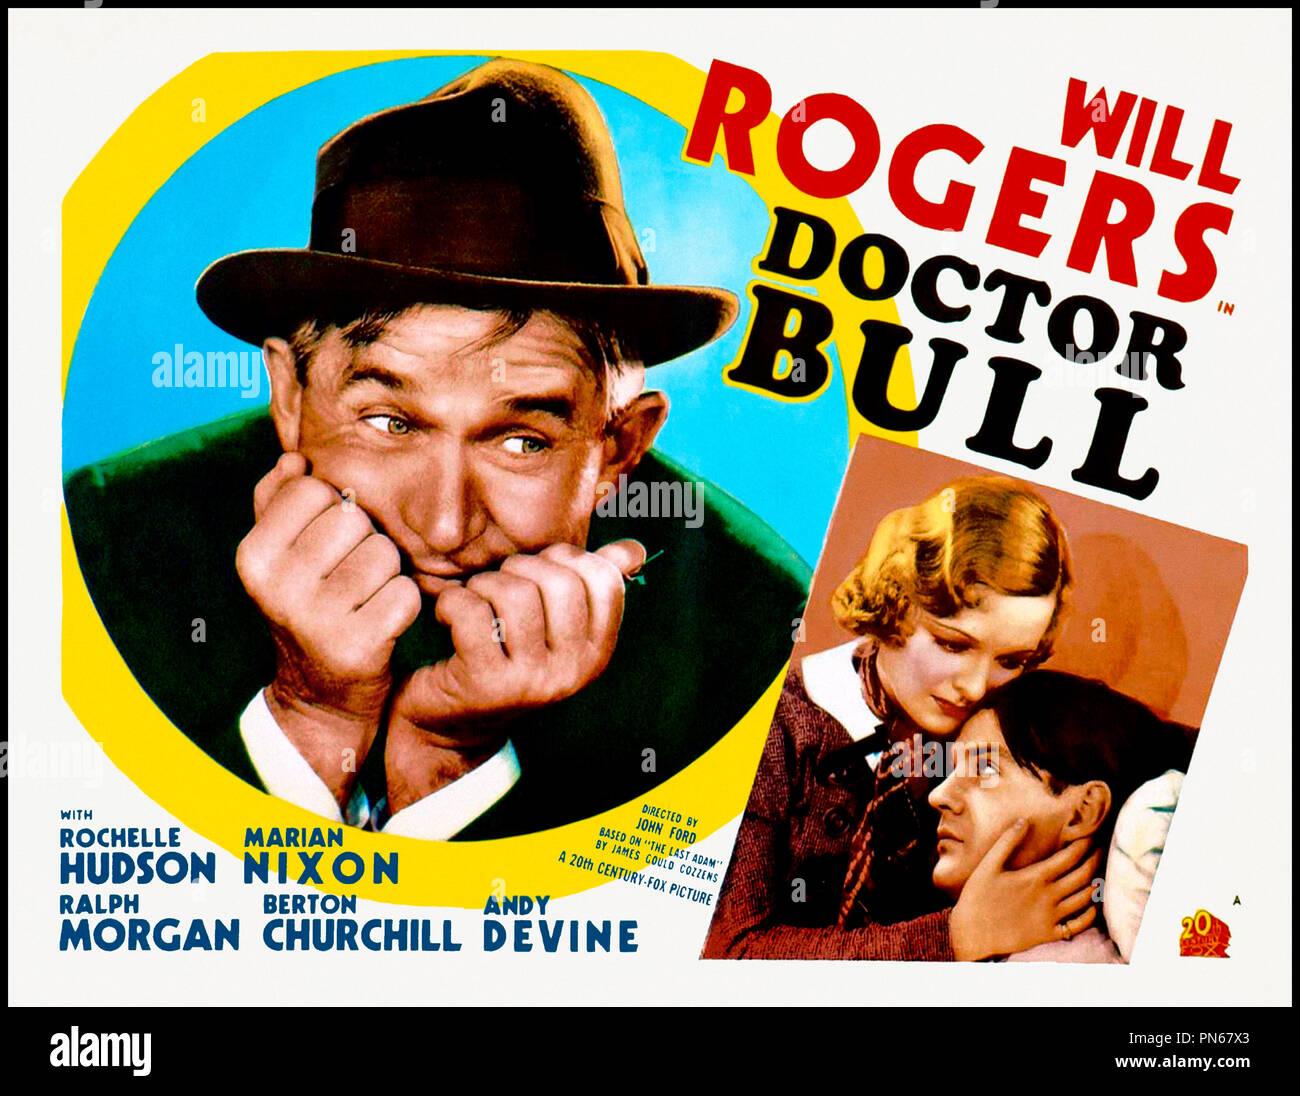 prod-db-20th-century-fox-dr-doctor-bull-